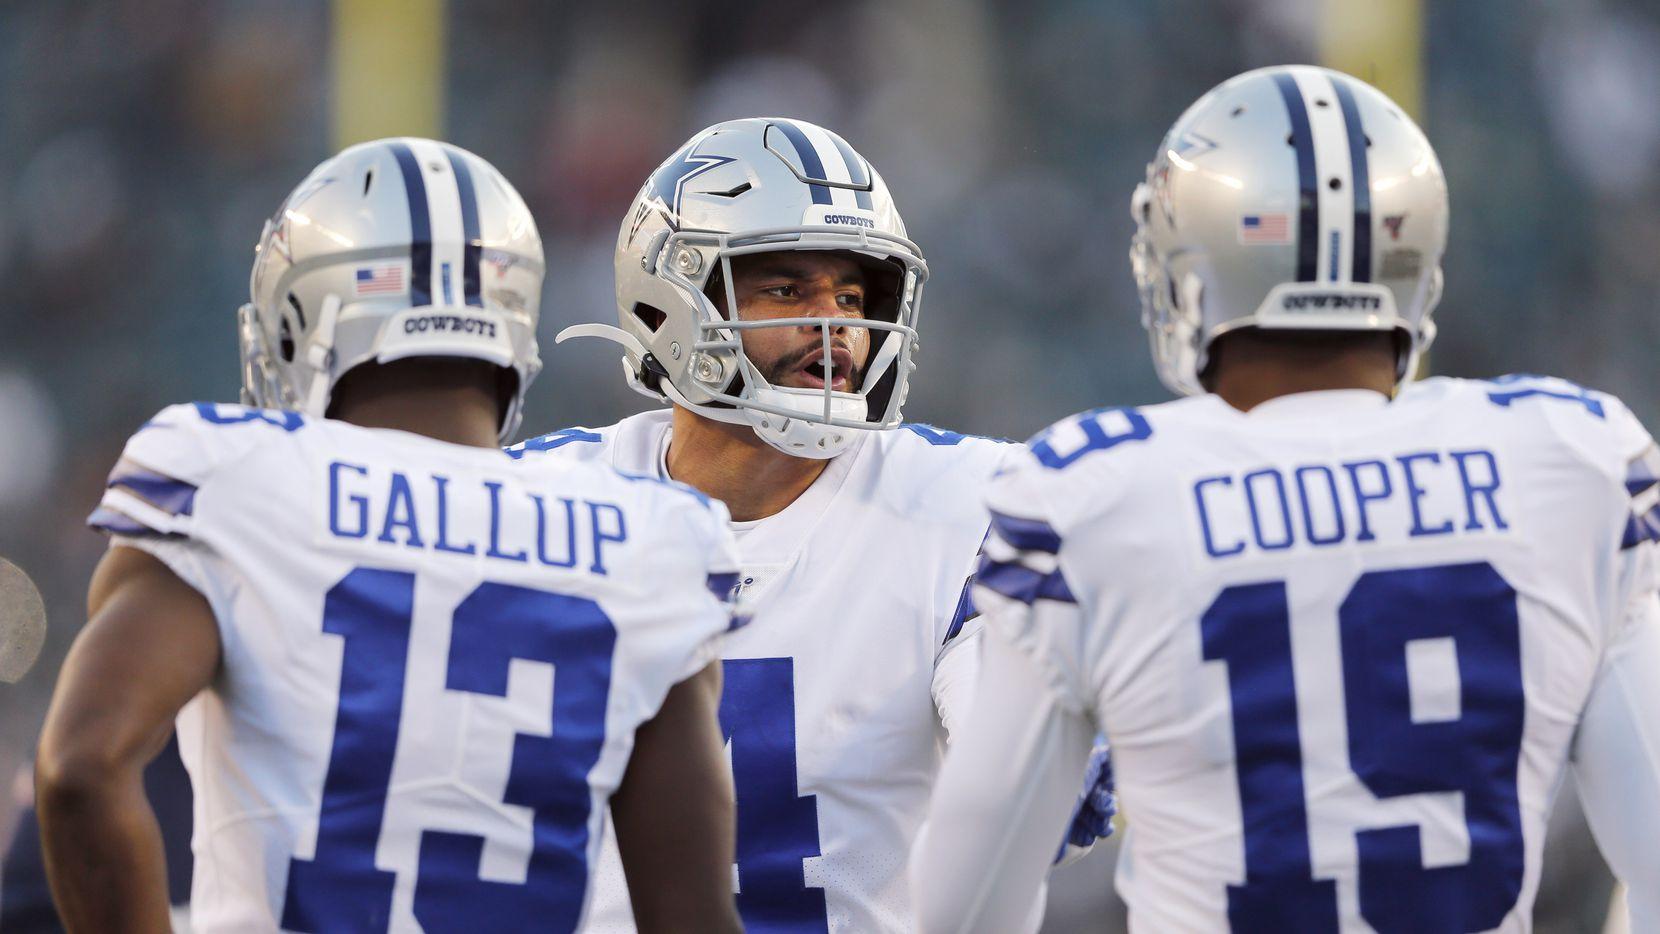 Dallas Cowboys quarterback Dak Prescott (4) talks with Dallas Cowboys wide receiver Michael Gallup (13) and Dallas Cowboys wide receiver Amari Cooper (19) during warmups before a game against the Philadelphia Eagles at Lincoln Financial Field in Philadelphia on Sunday, December 22, 2019.